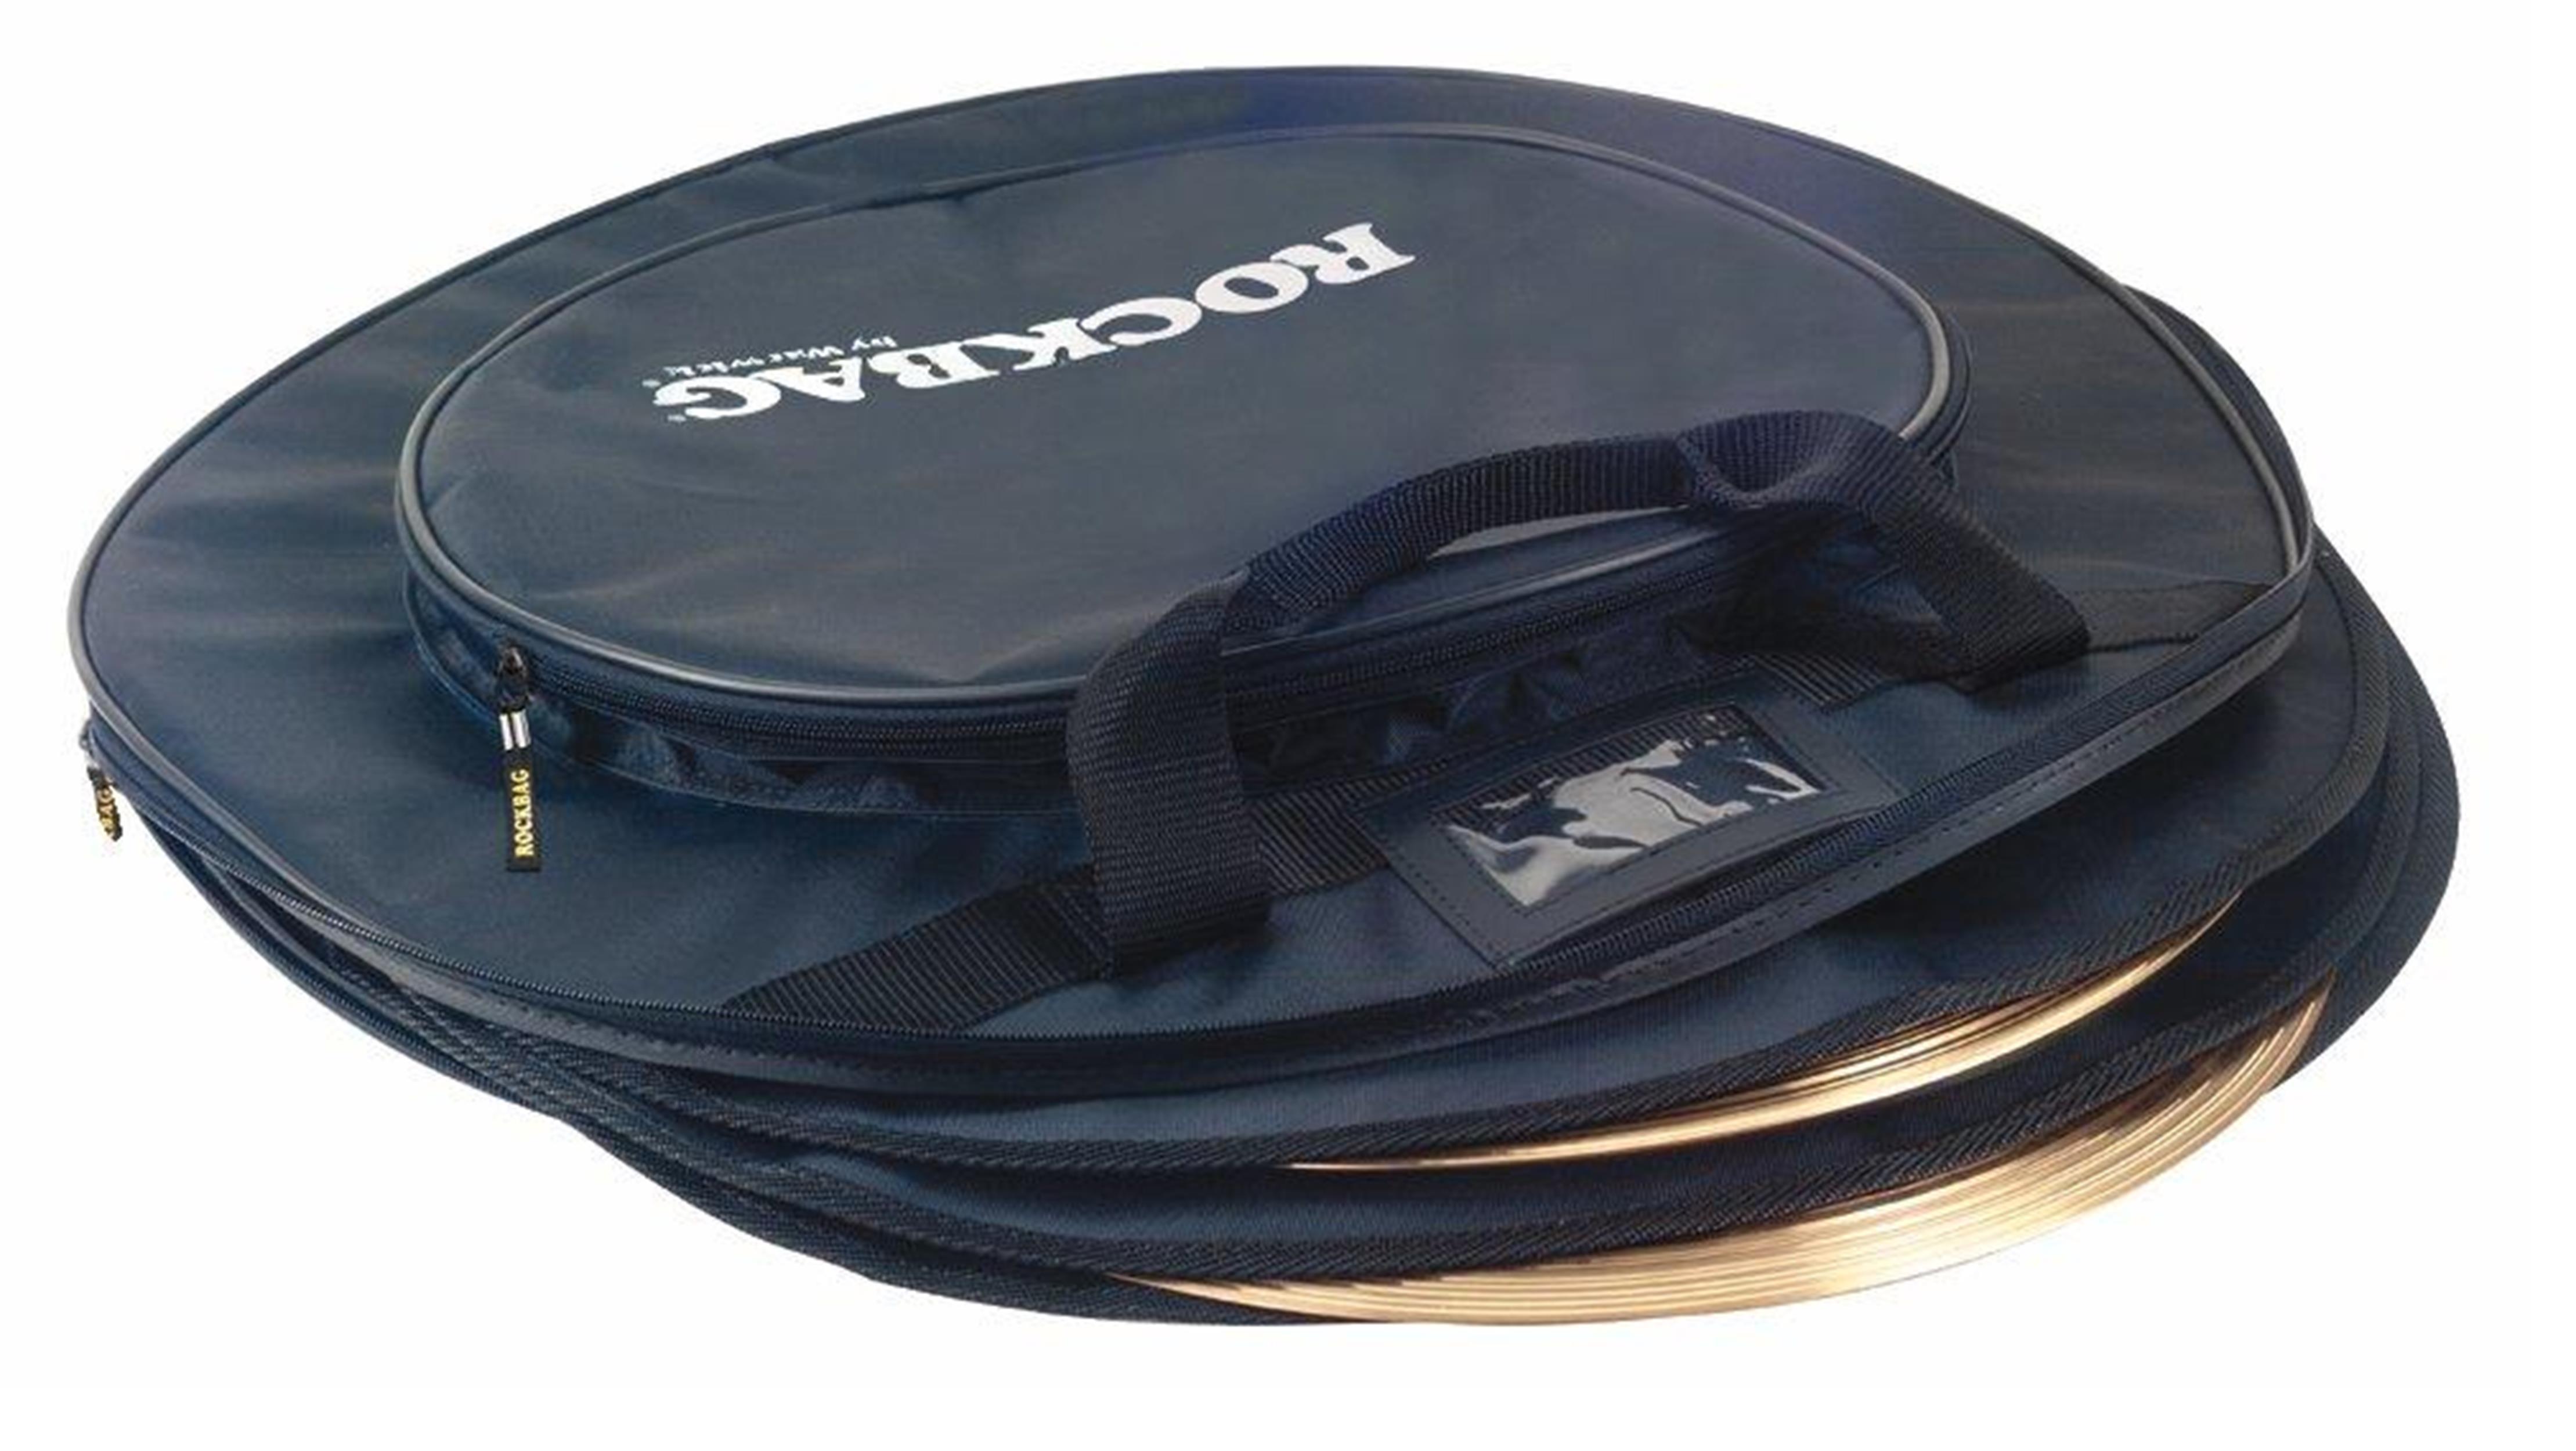 ROCKBAG RB22440 FODERO PIATTI RB22440B Student cymbal Bag 56 cm/22''